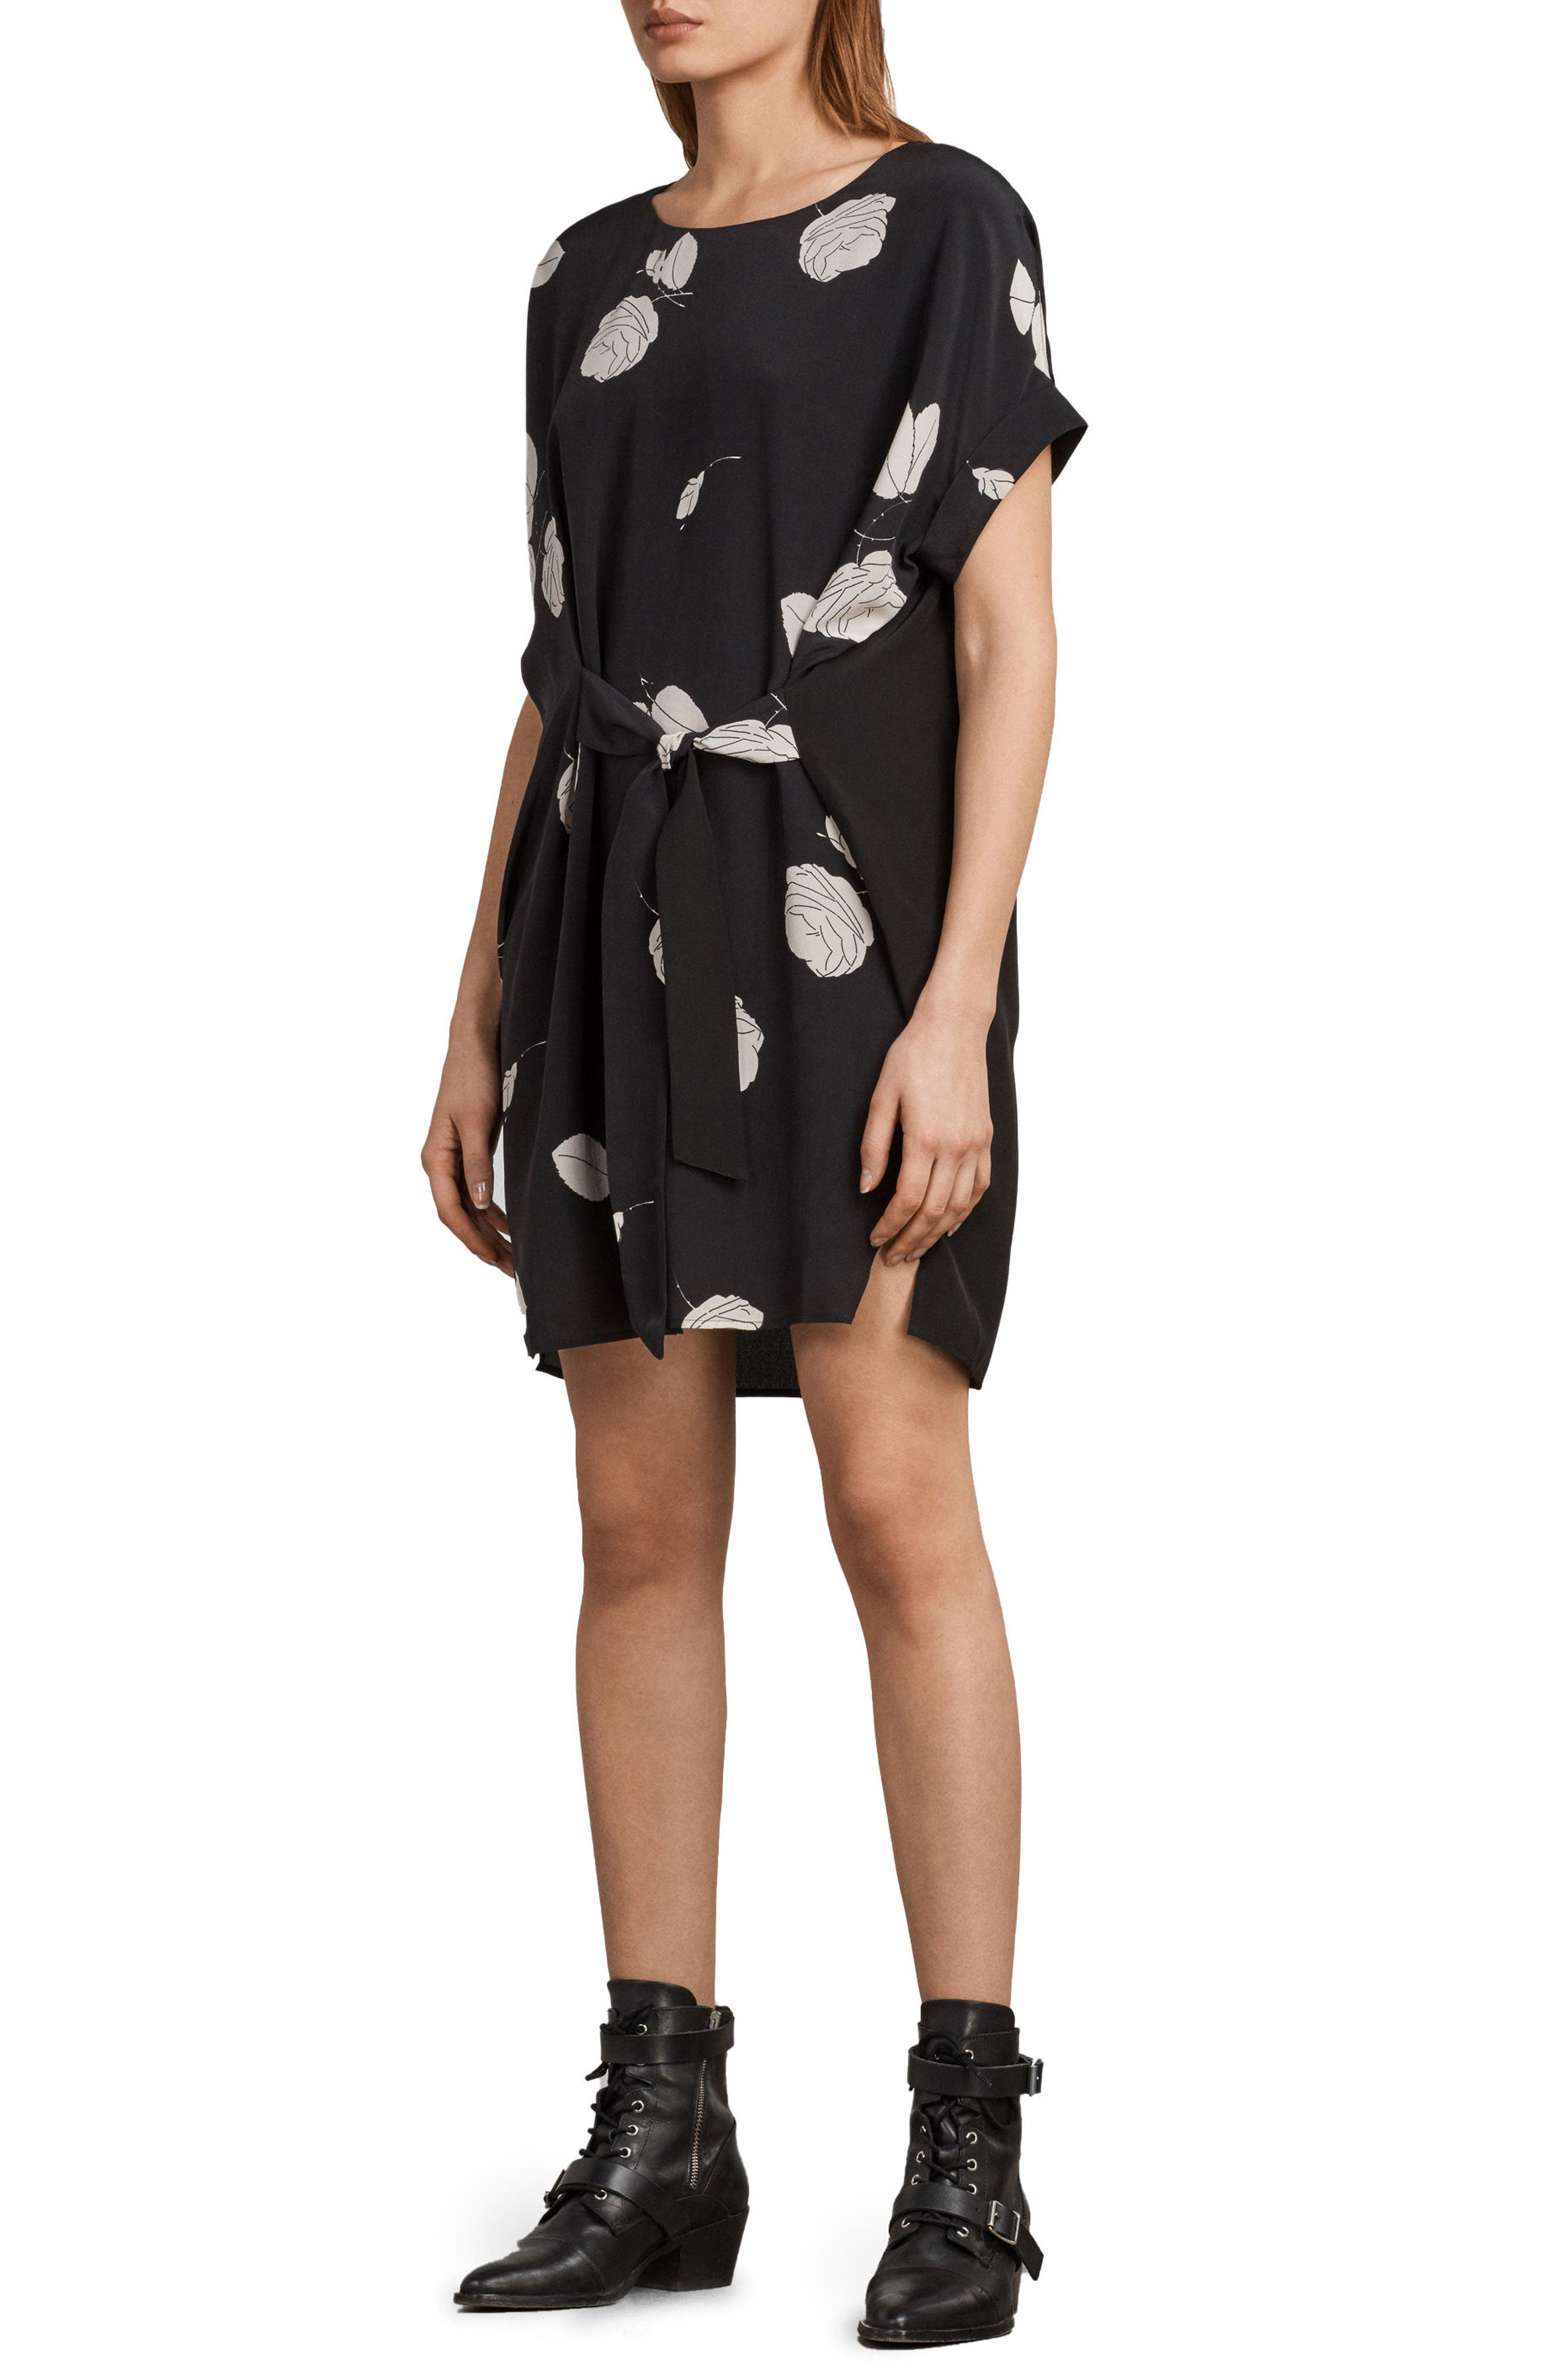 Sonny Rodin Silk Dress,                             Alternate thumbnail 6, color,